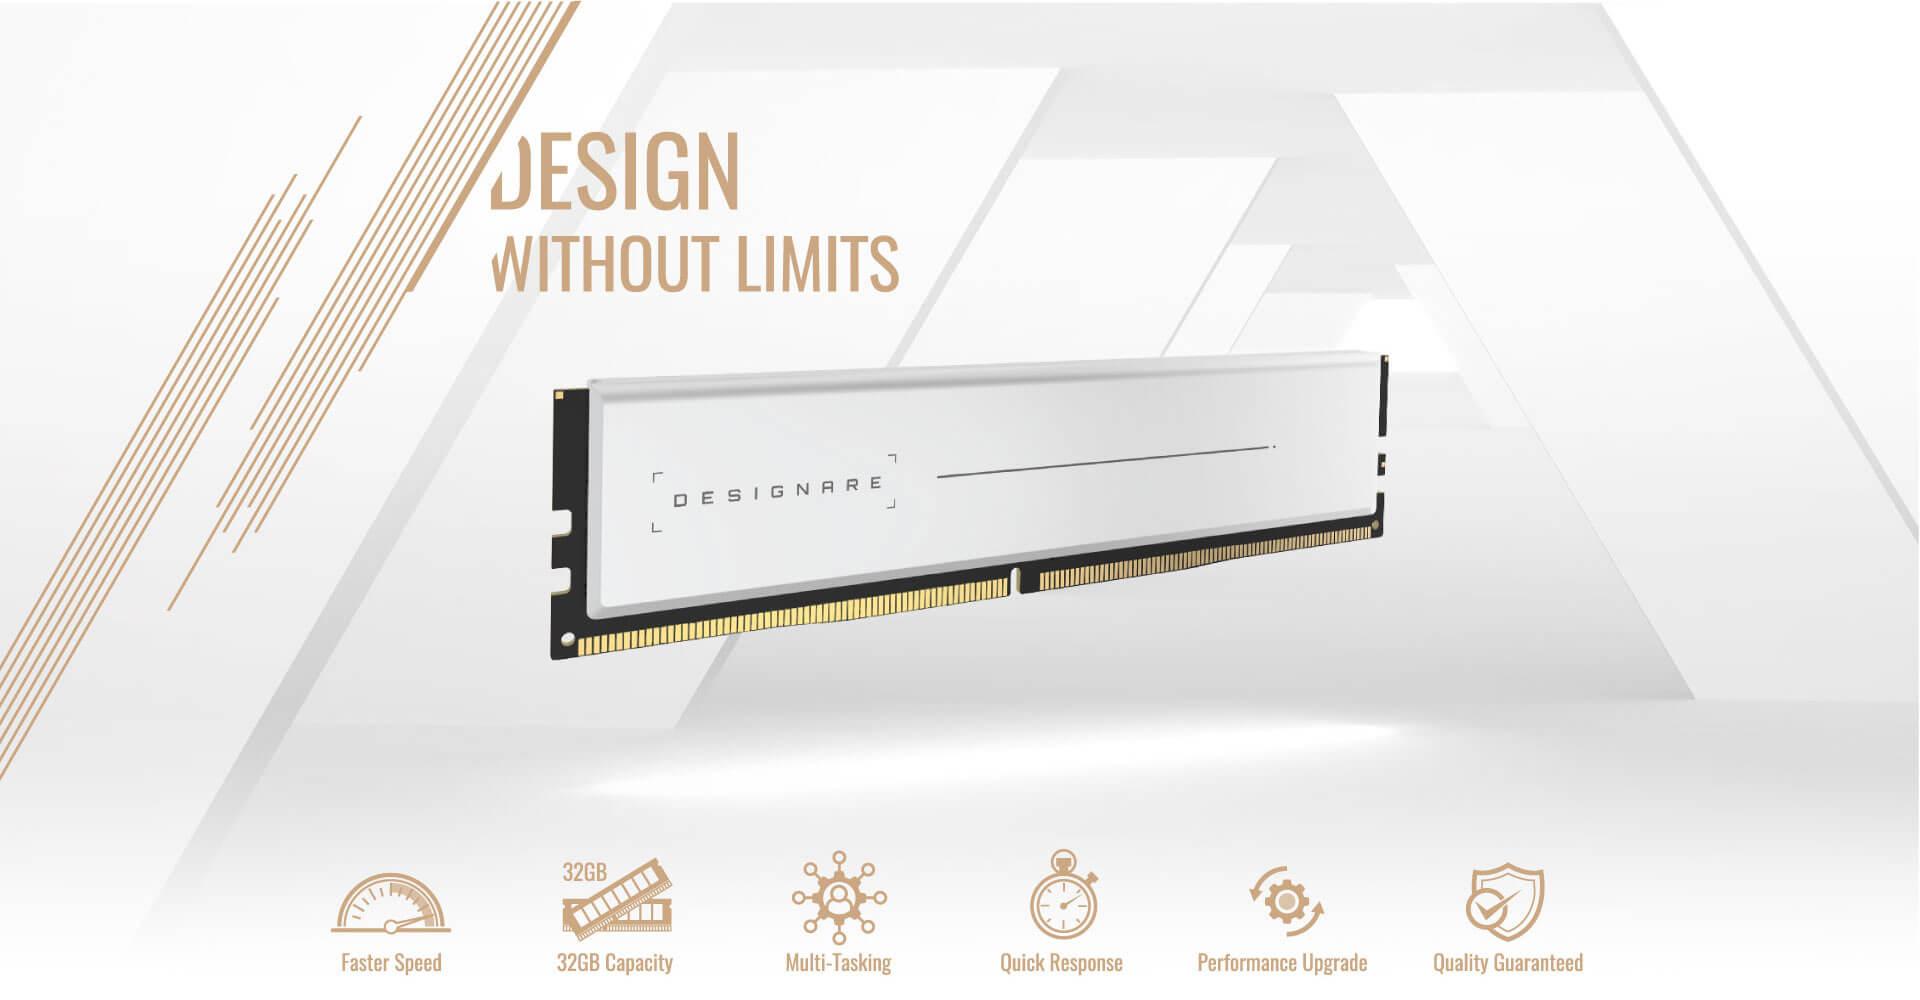 Gigabyte DESIGNARE Memory 64GB (2x32GB) 3200MHz - GP-DSG64G32 5